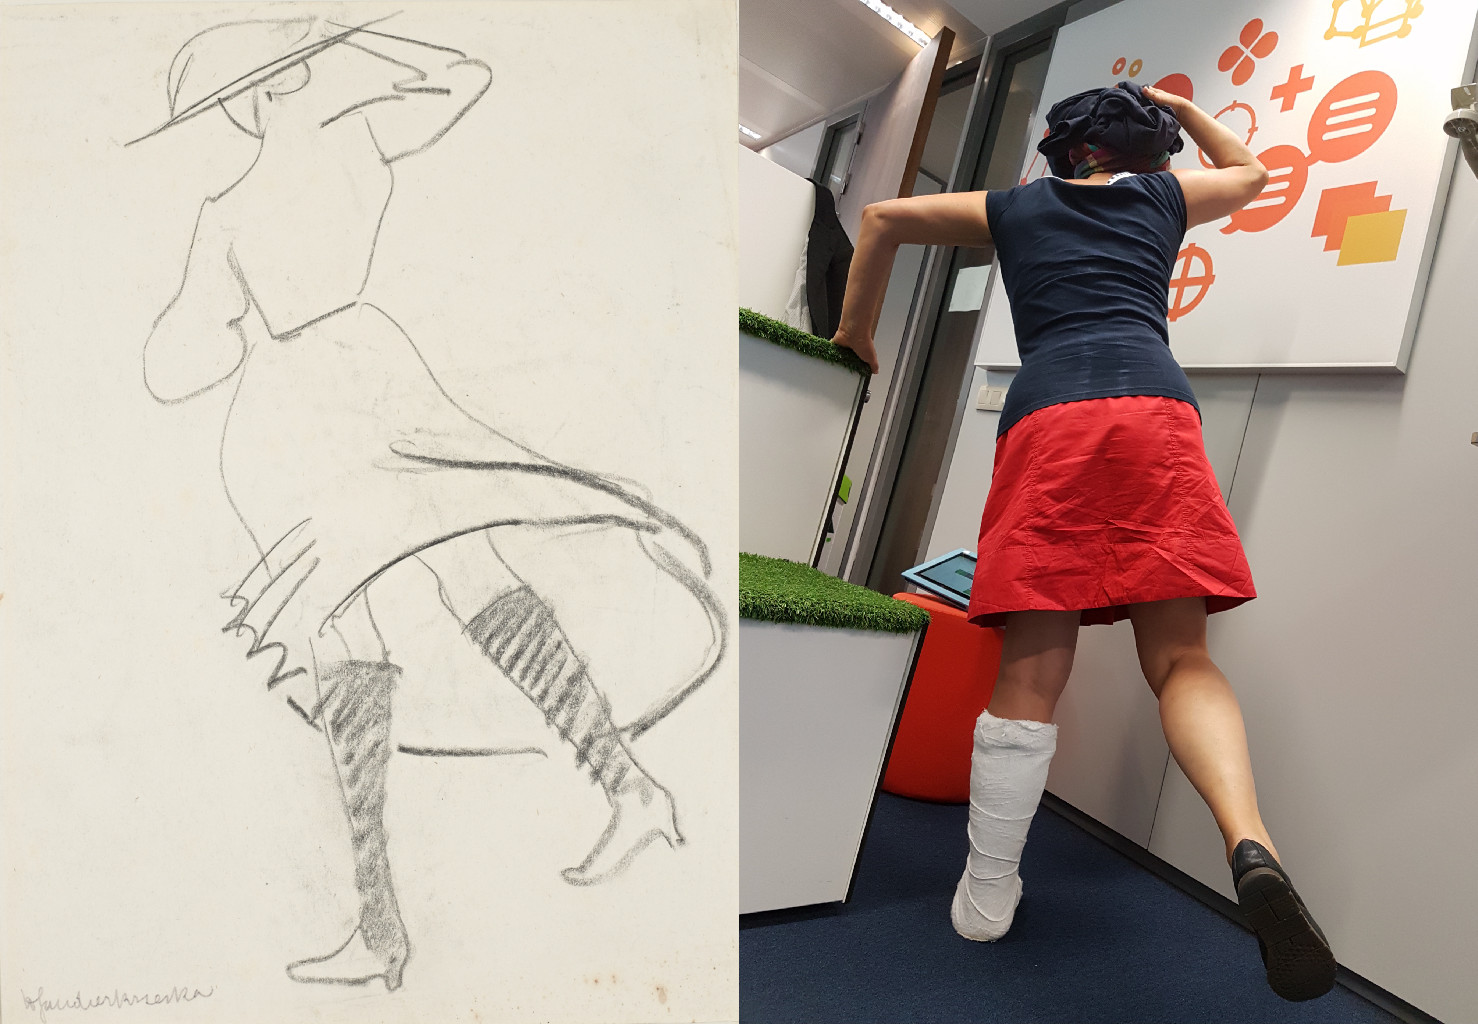 Girl with skirt blowing, Henri Gaudier-Brzeska (1891-1915)  vanGo'd by Antonoi J V